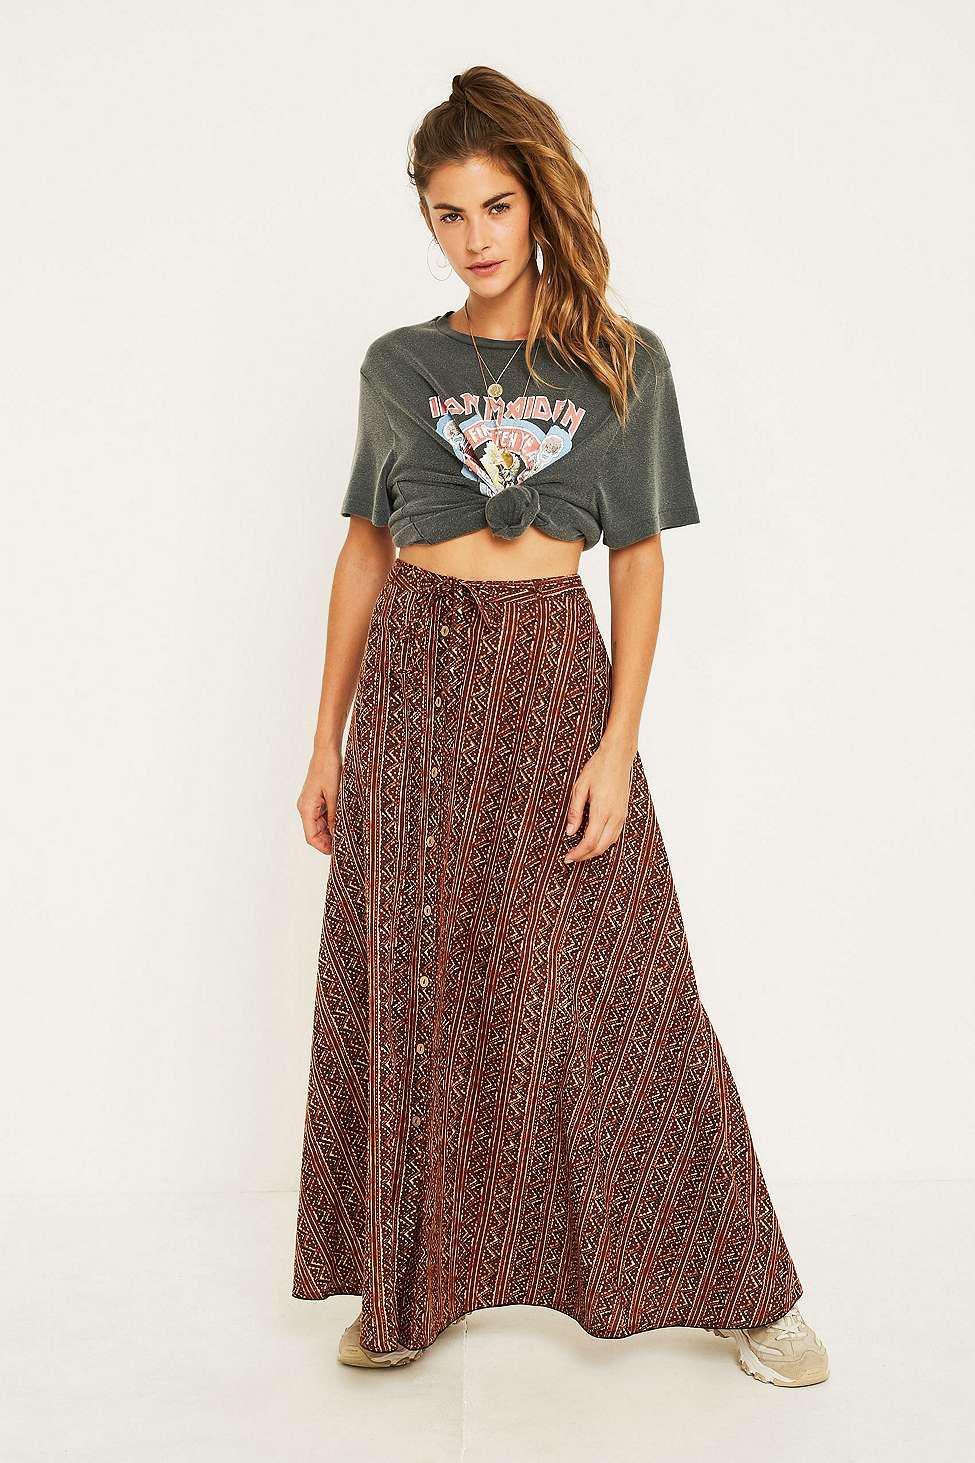 106946b4b Urban Renewal Vintage Remnants Block Print Circle Skirt - Womens S ...